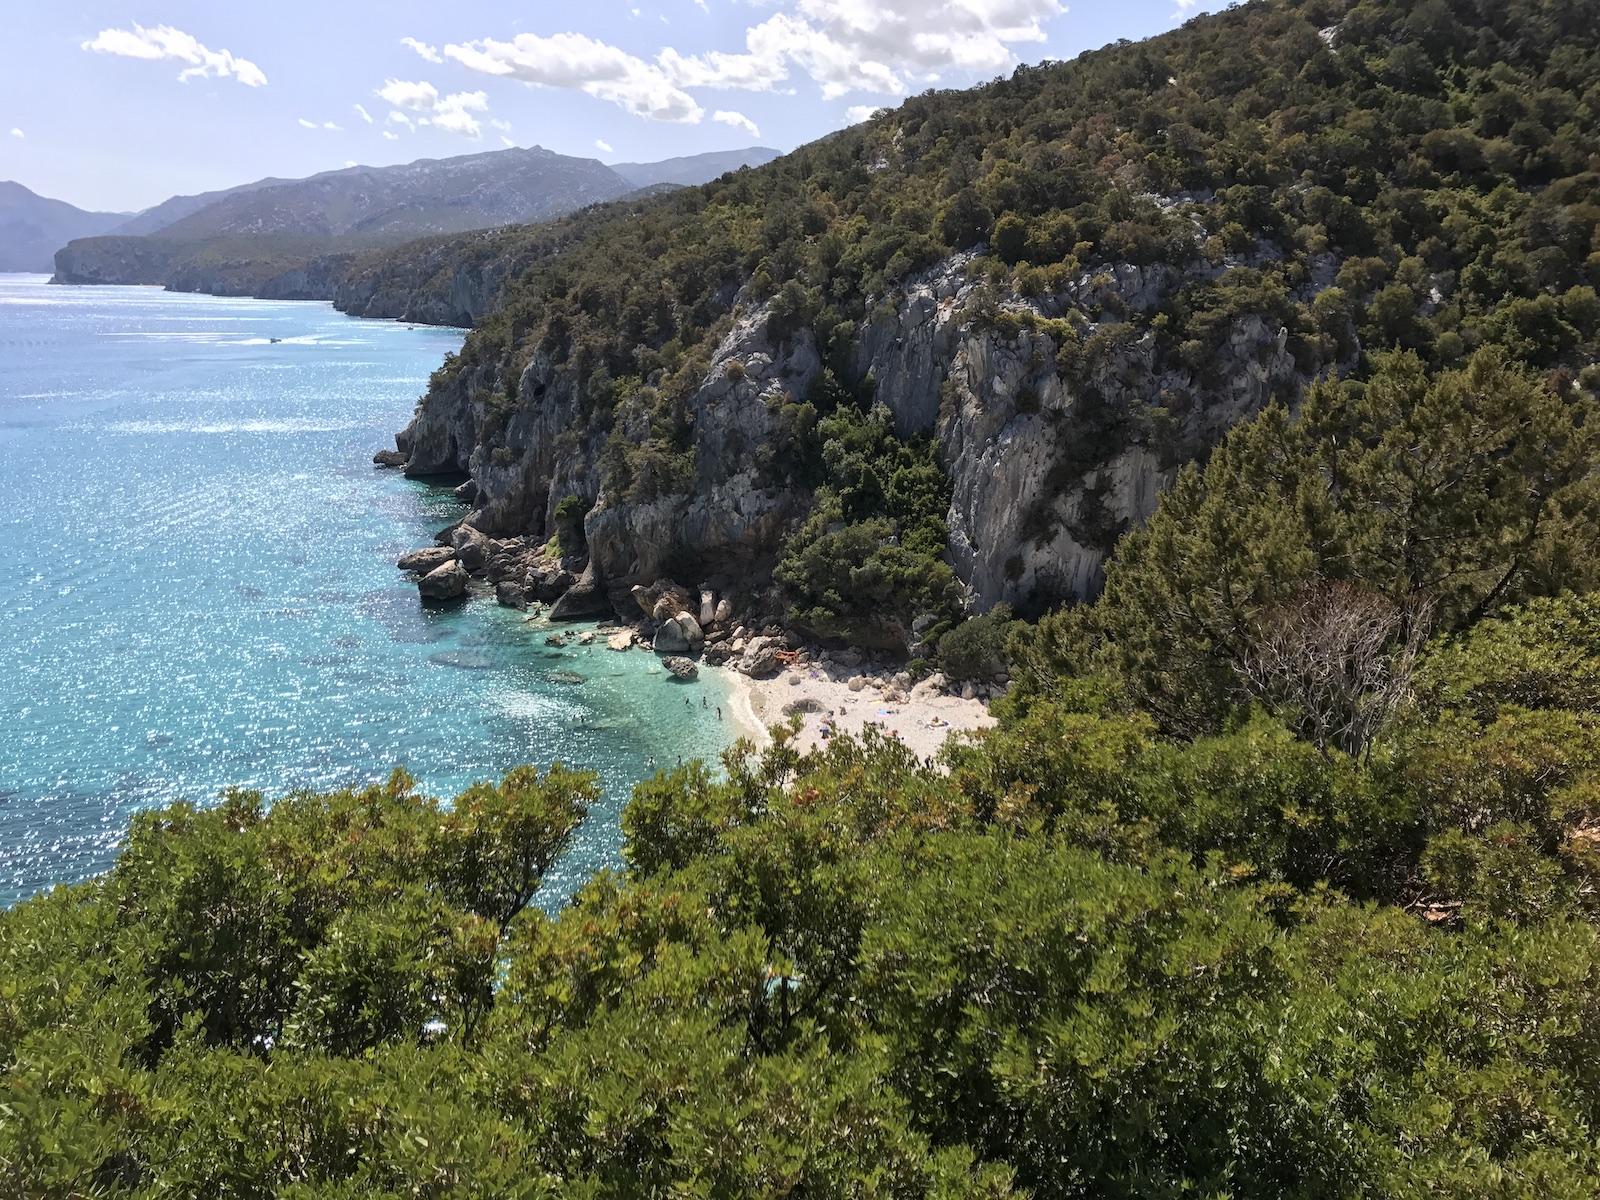 tourameo-reiseplanung-individualreise-europa-sardinien-bucht